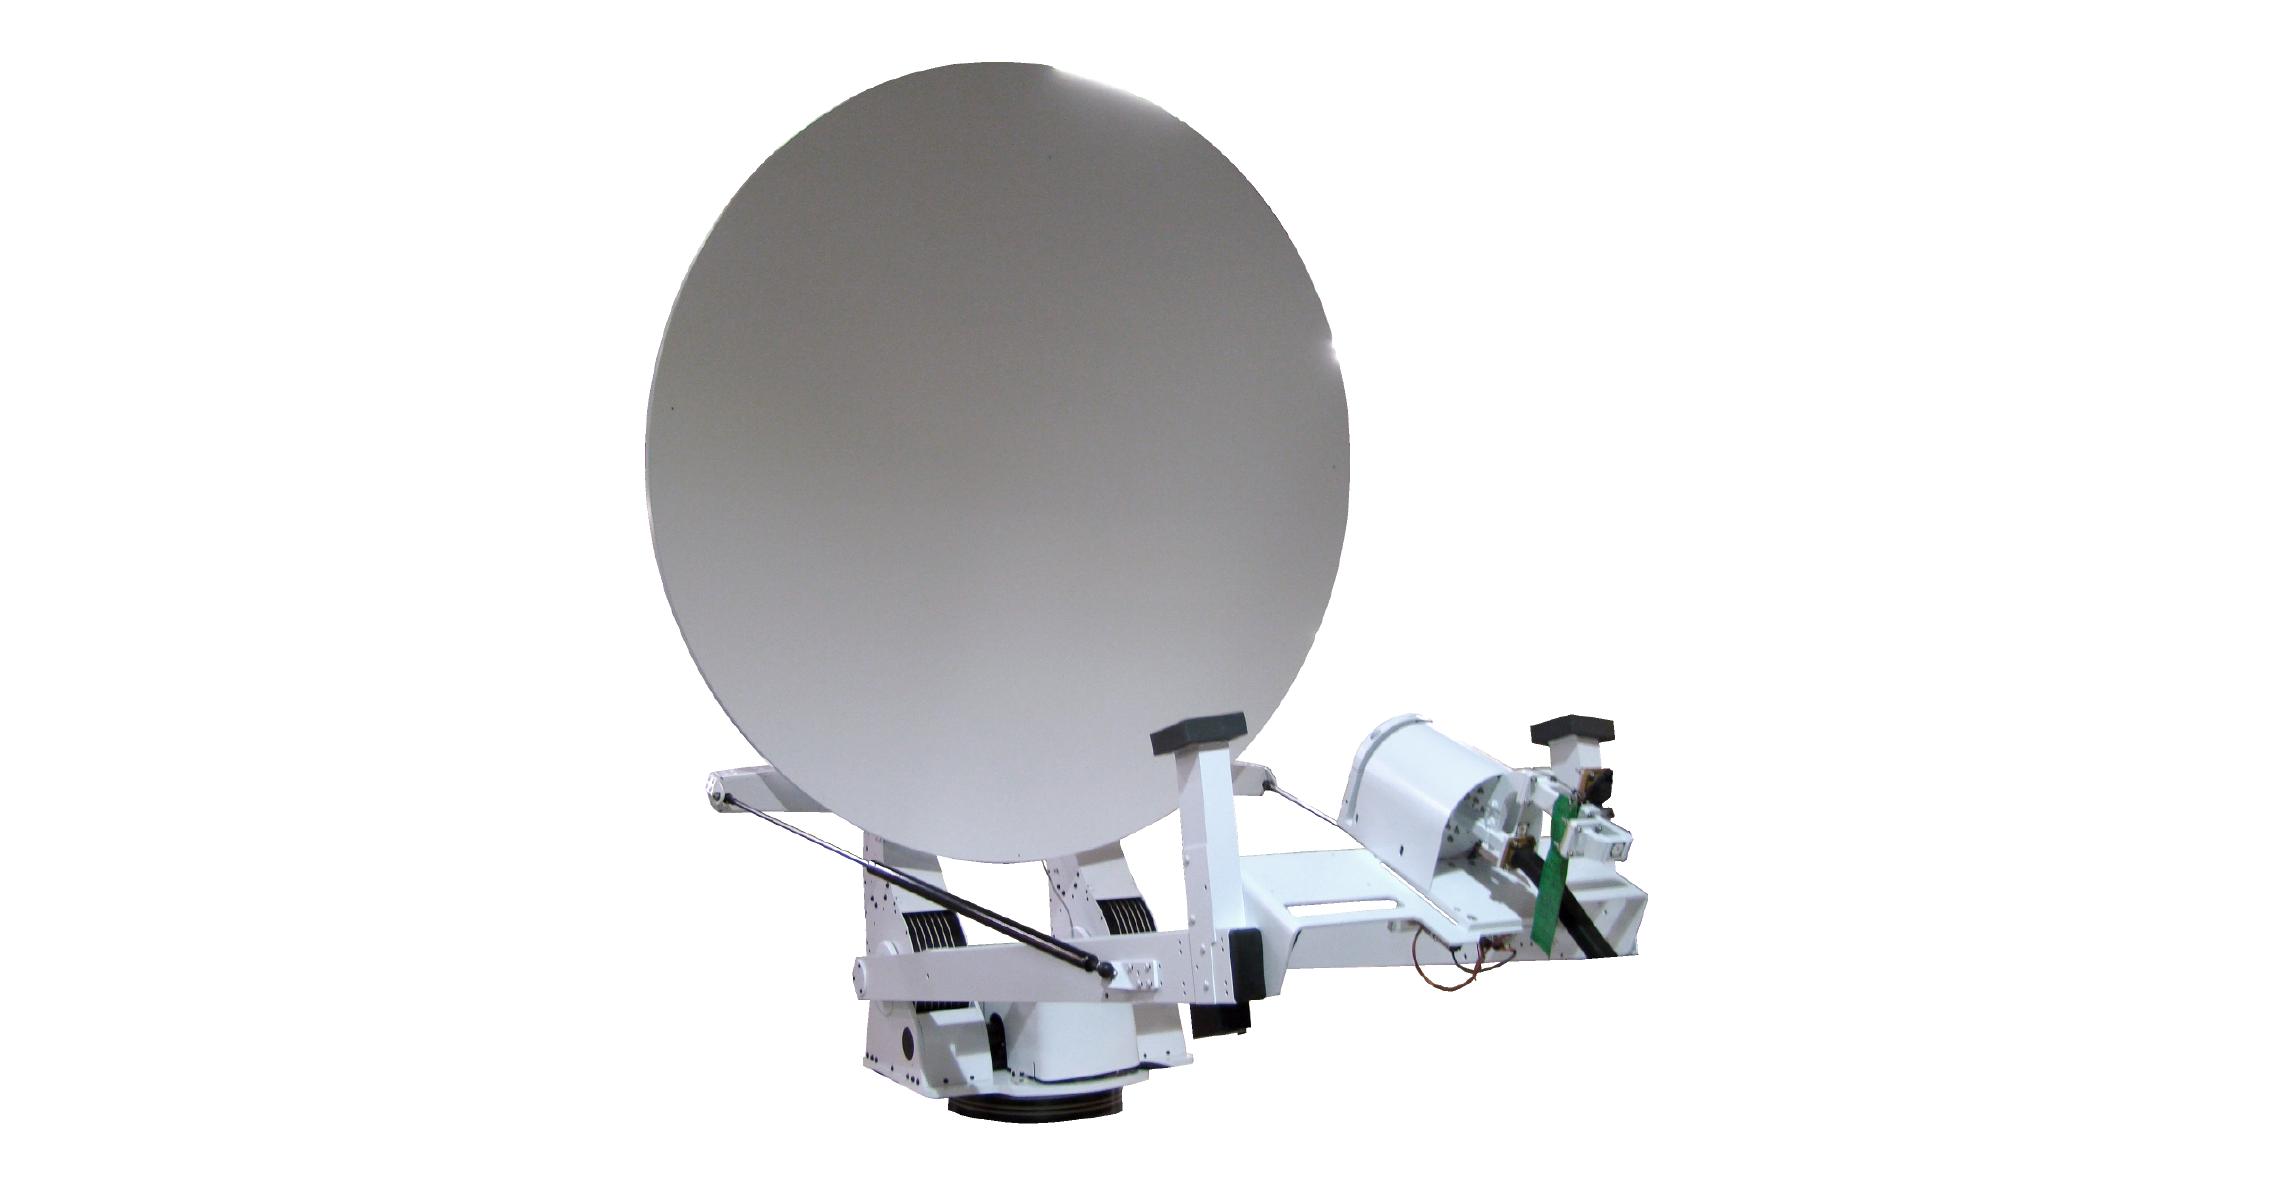 C140M 1.40m. Antenna